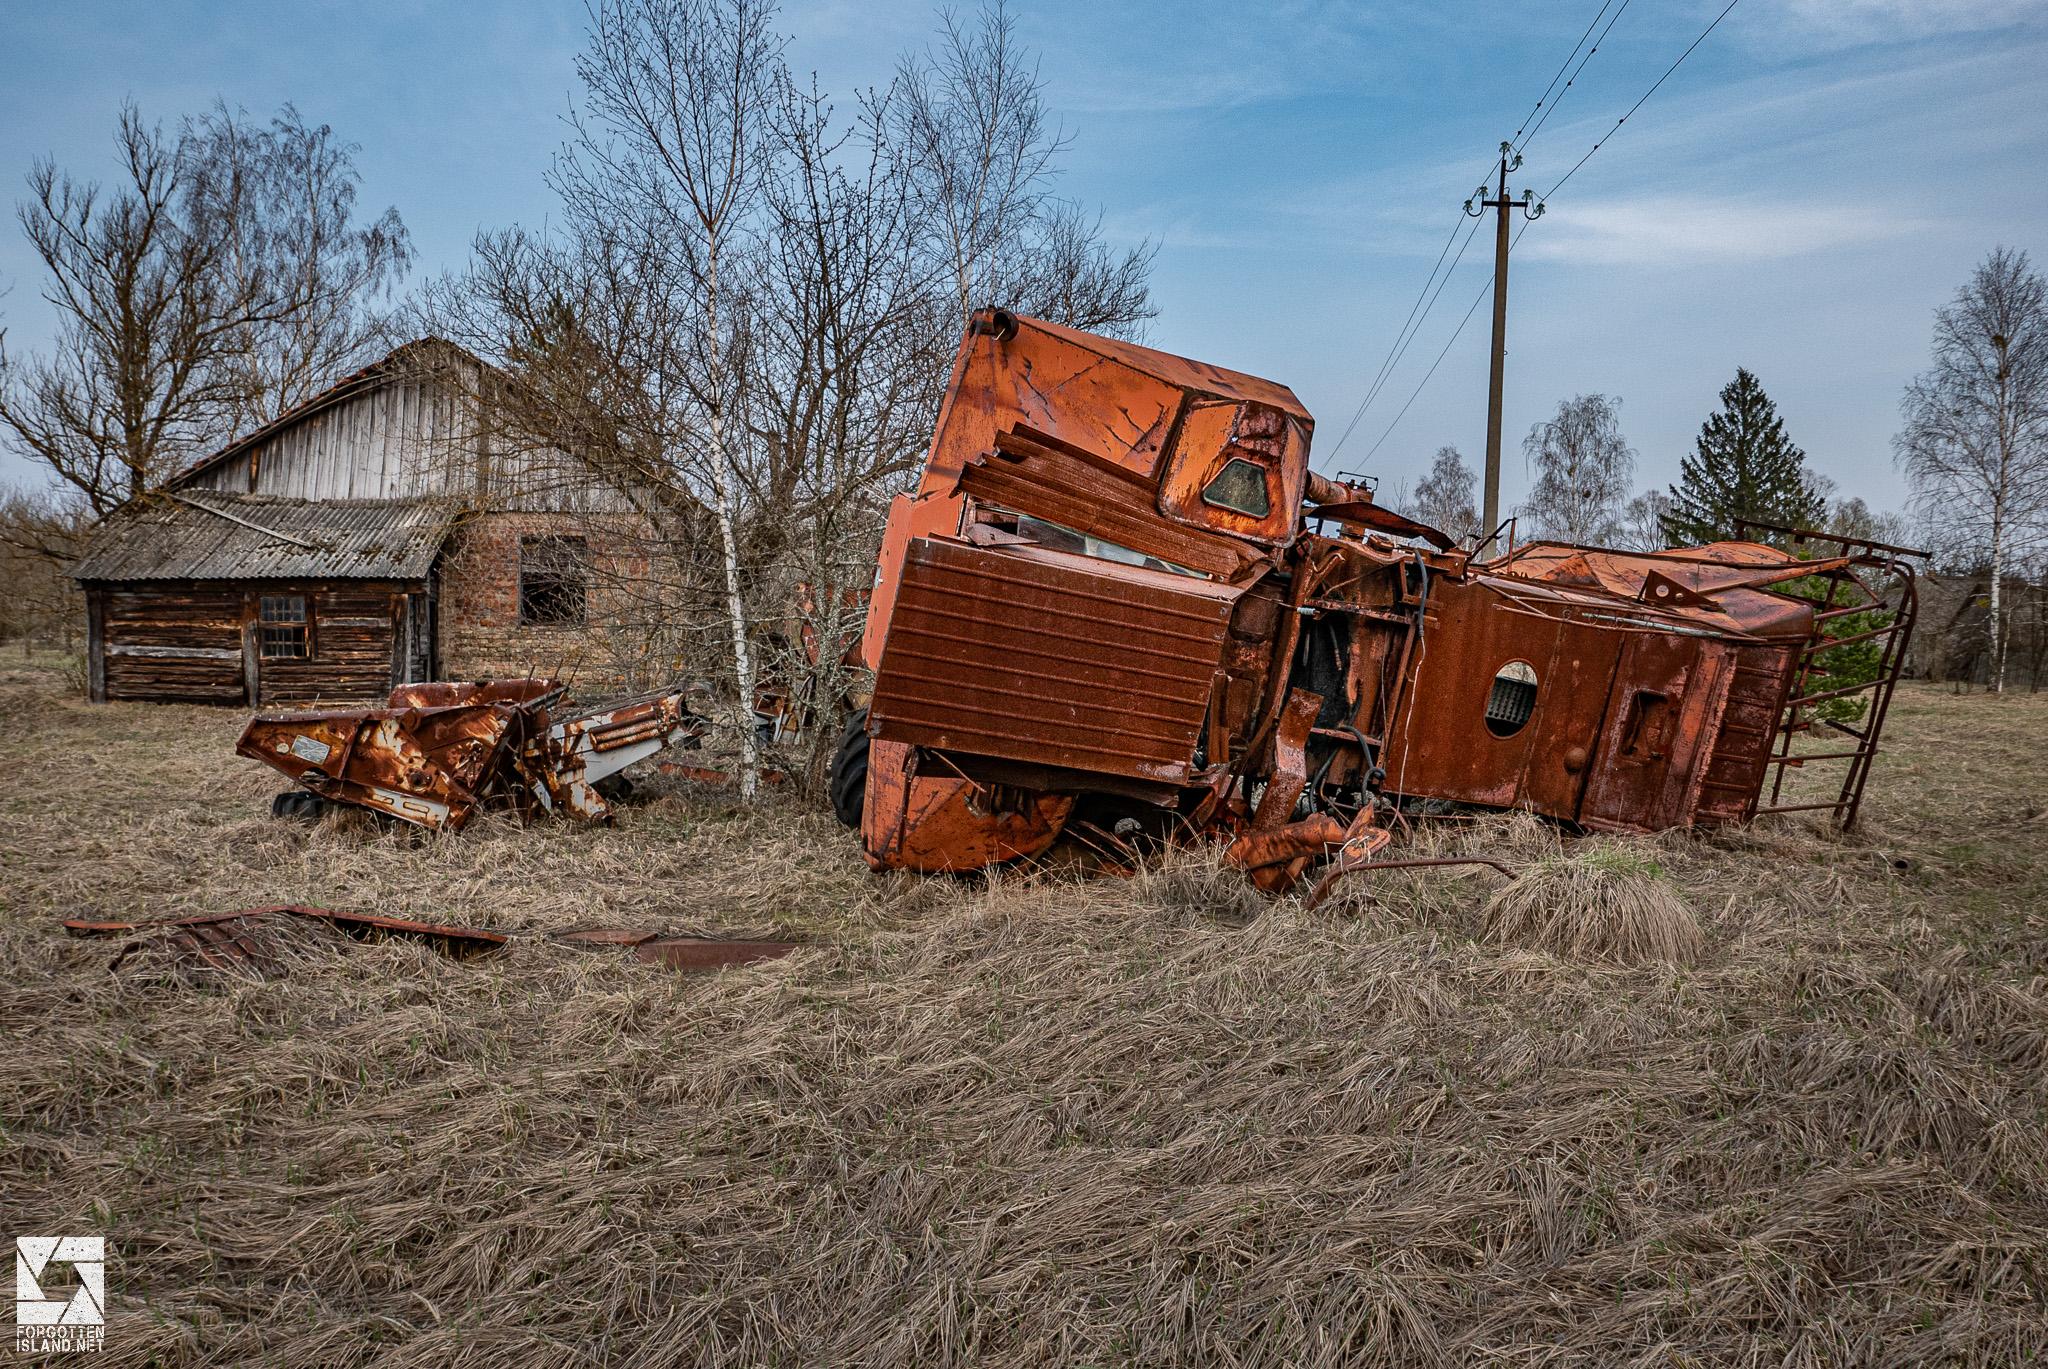 Abandoned Combine Harvester on a farm in Paryshev village